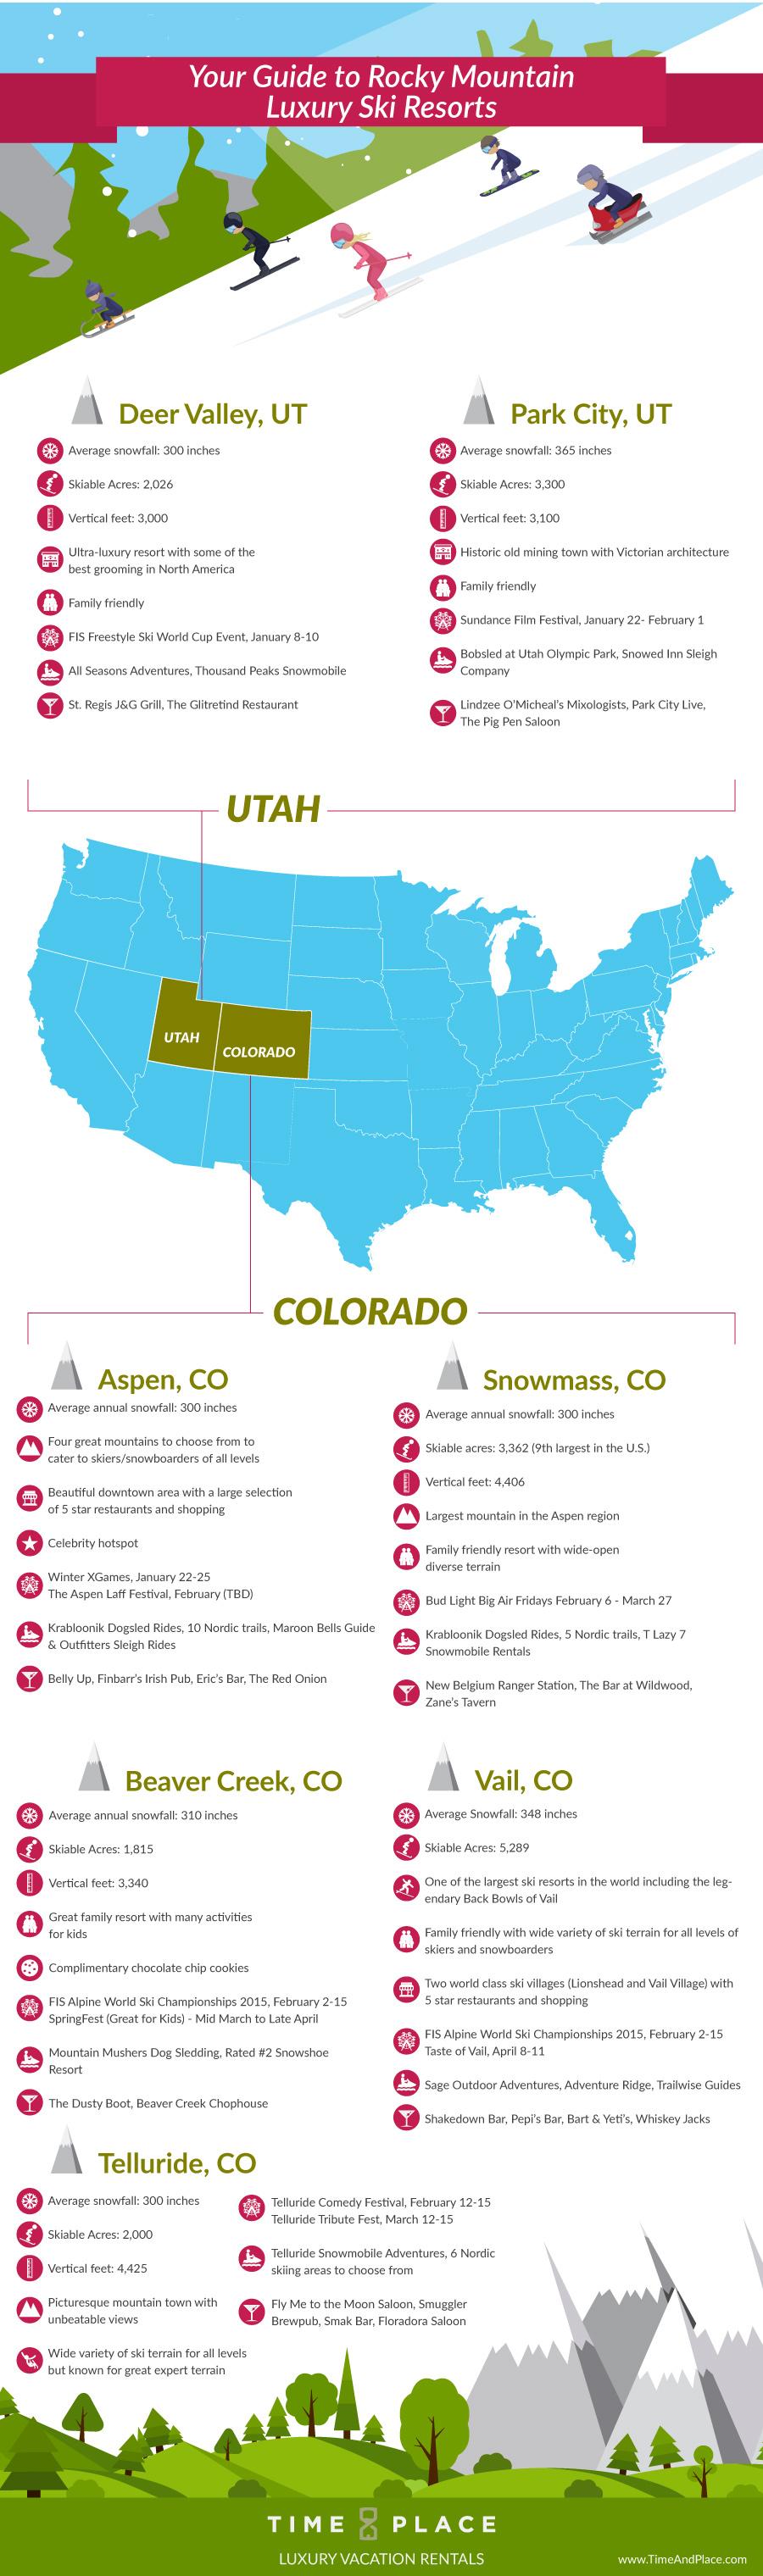 Best Colorado Ski Resorts - Utah Ski Resorts